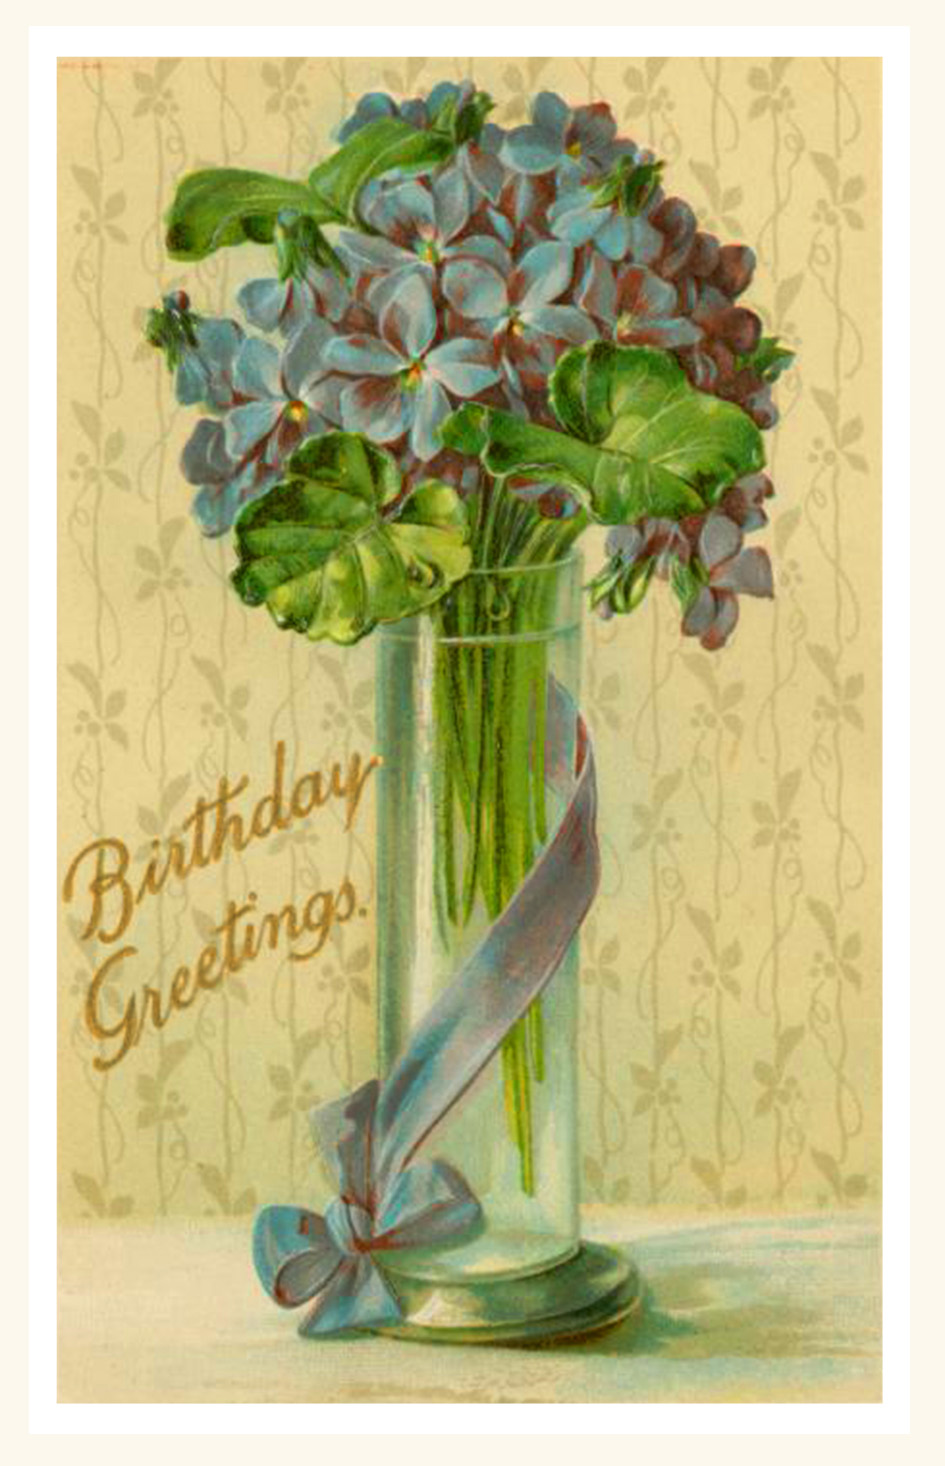 birthday_greeting-card-flowers-2